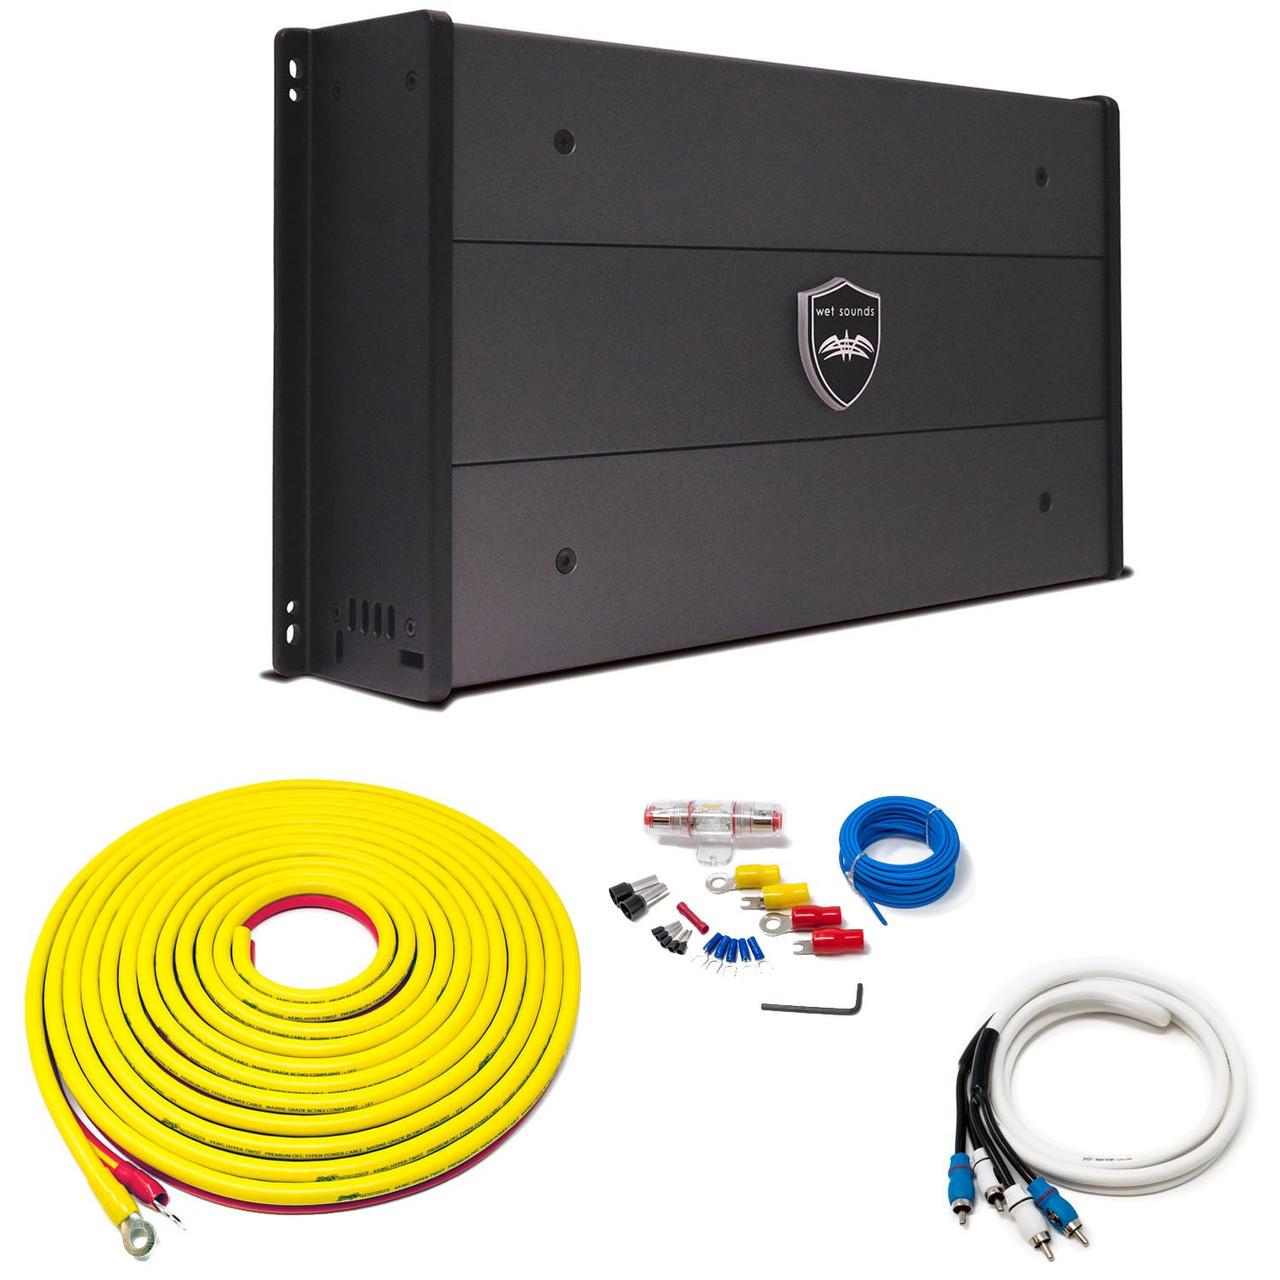 Wet Sounds SYN-DX-2.3HP SYN-DX Series Marine Amplifier & Stinger 7-Meter  4-Gauge Amplifier Wiring Kit w/ RCAs - Creative Audio